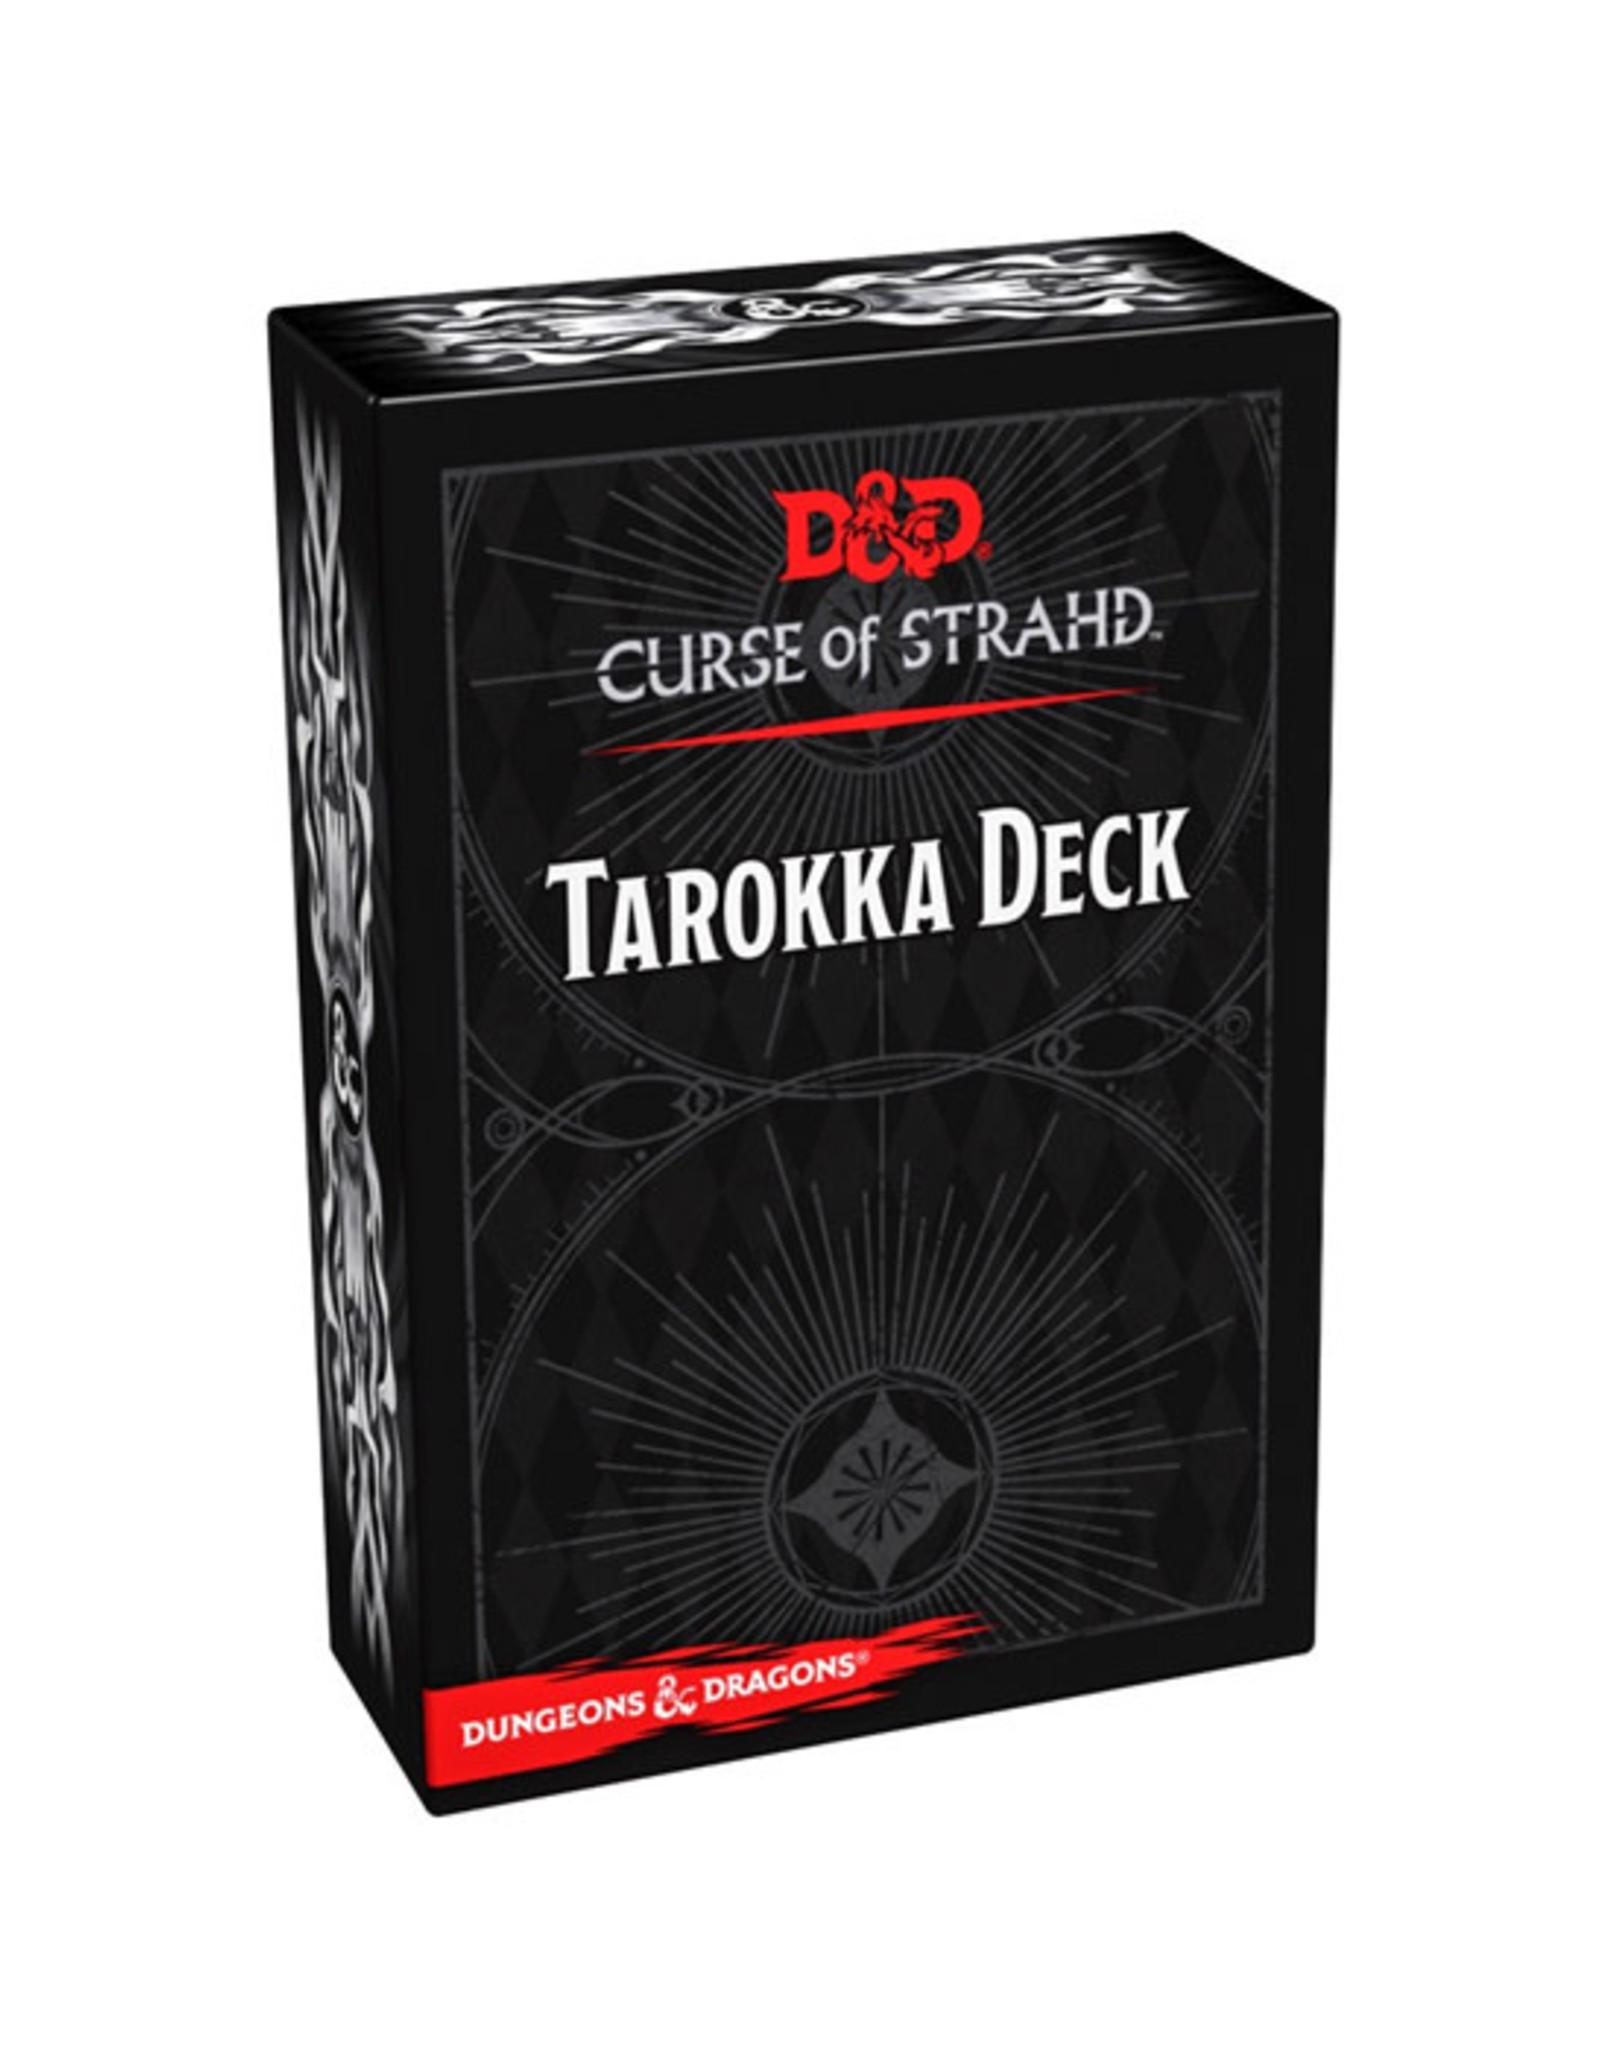 Dungeons & Dragons Dungeons & Dragons: 5th Edition - Curse of Strahd - Tarokka Deck